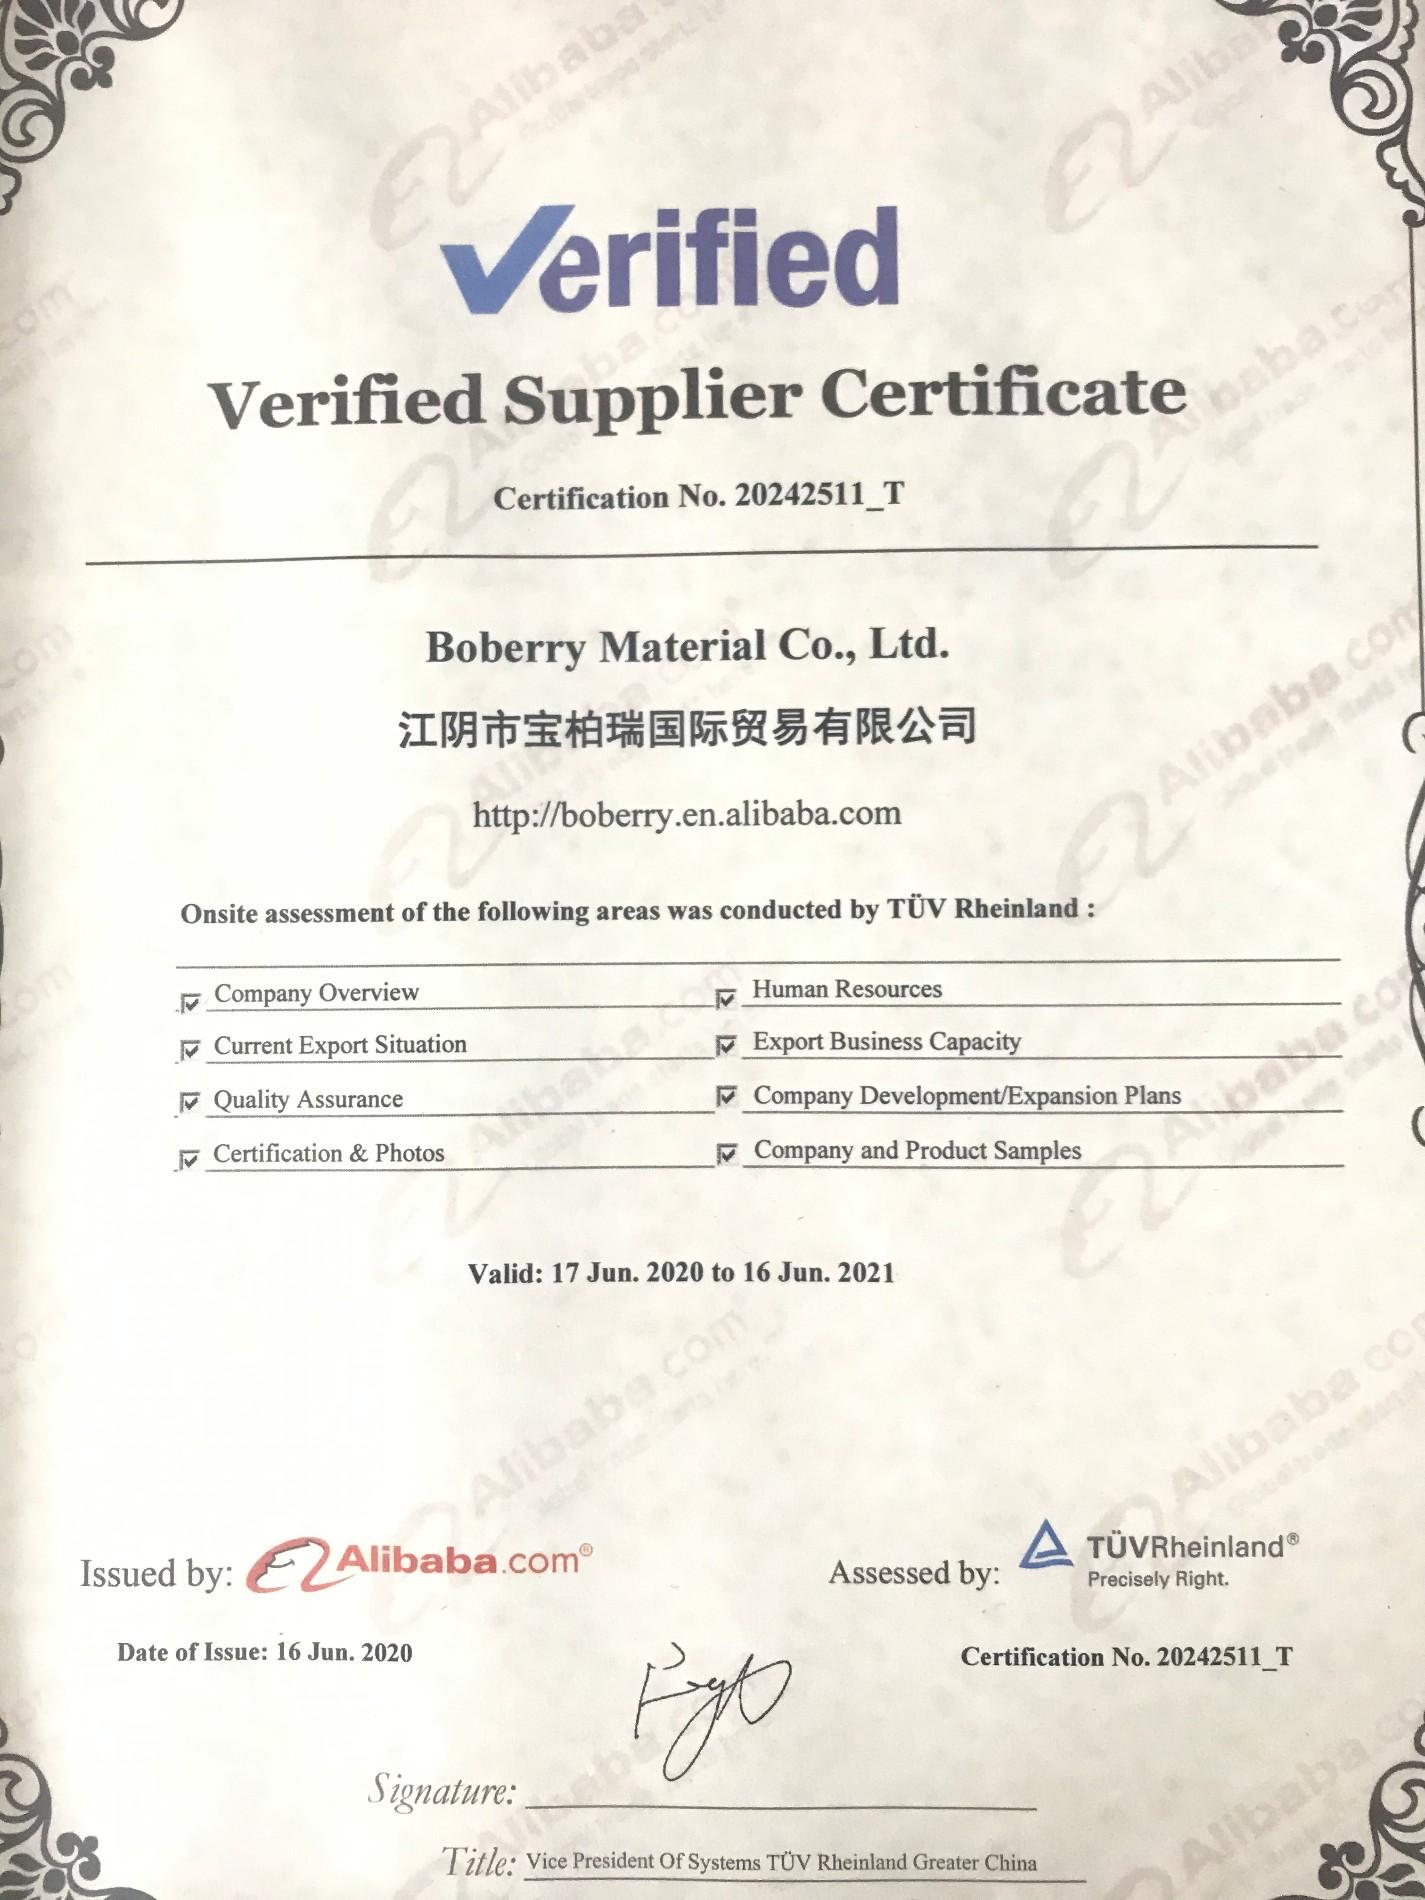 Verified supplier certificate 2